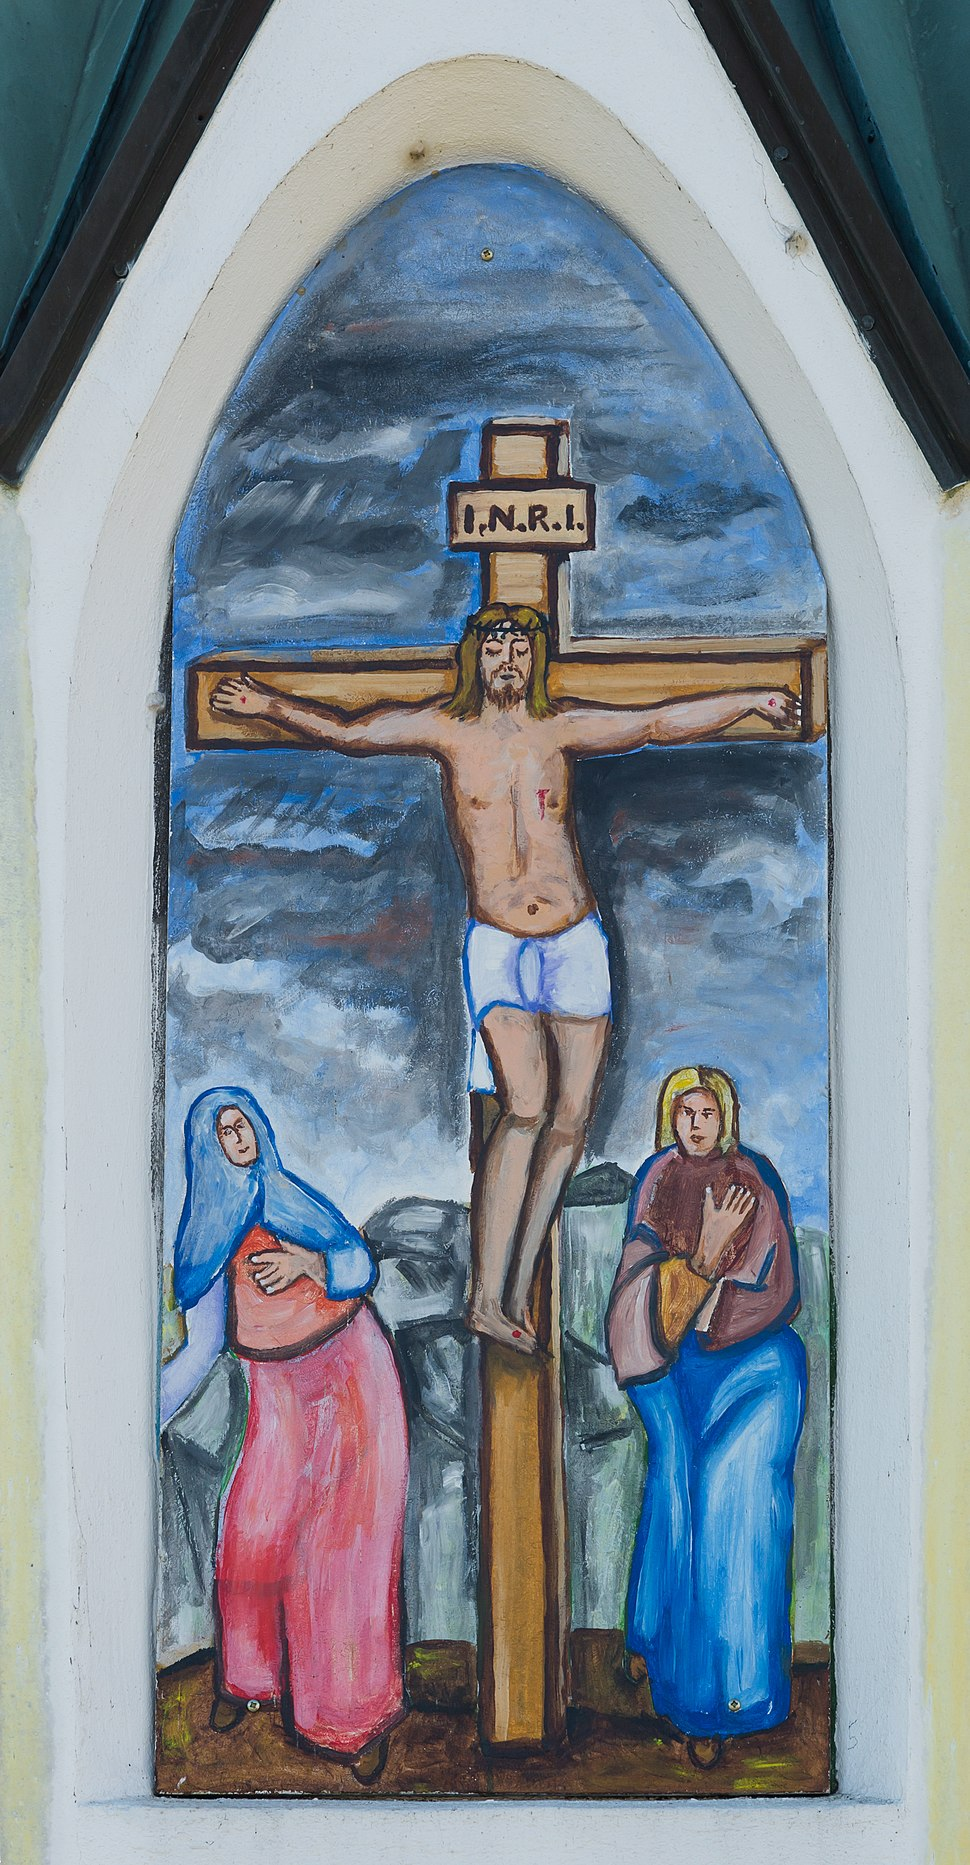 Sankt Georgen am Laengsee Launsdorf Kreisverkehr Bildstock Kreuzigung Christi 02122015 2428